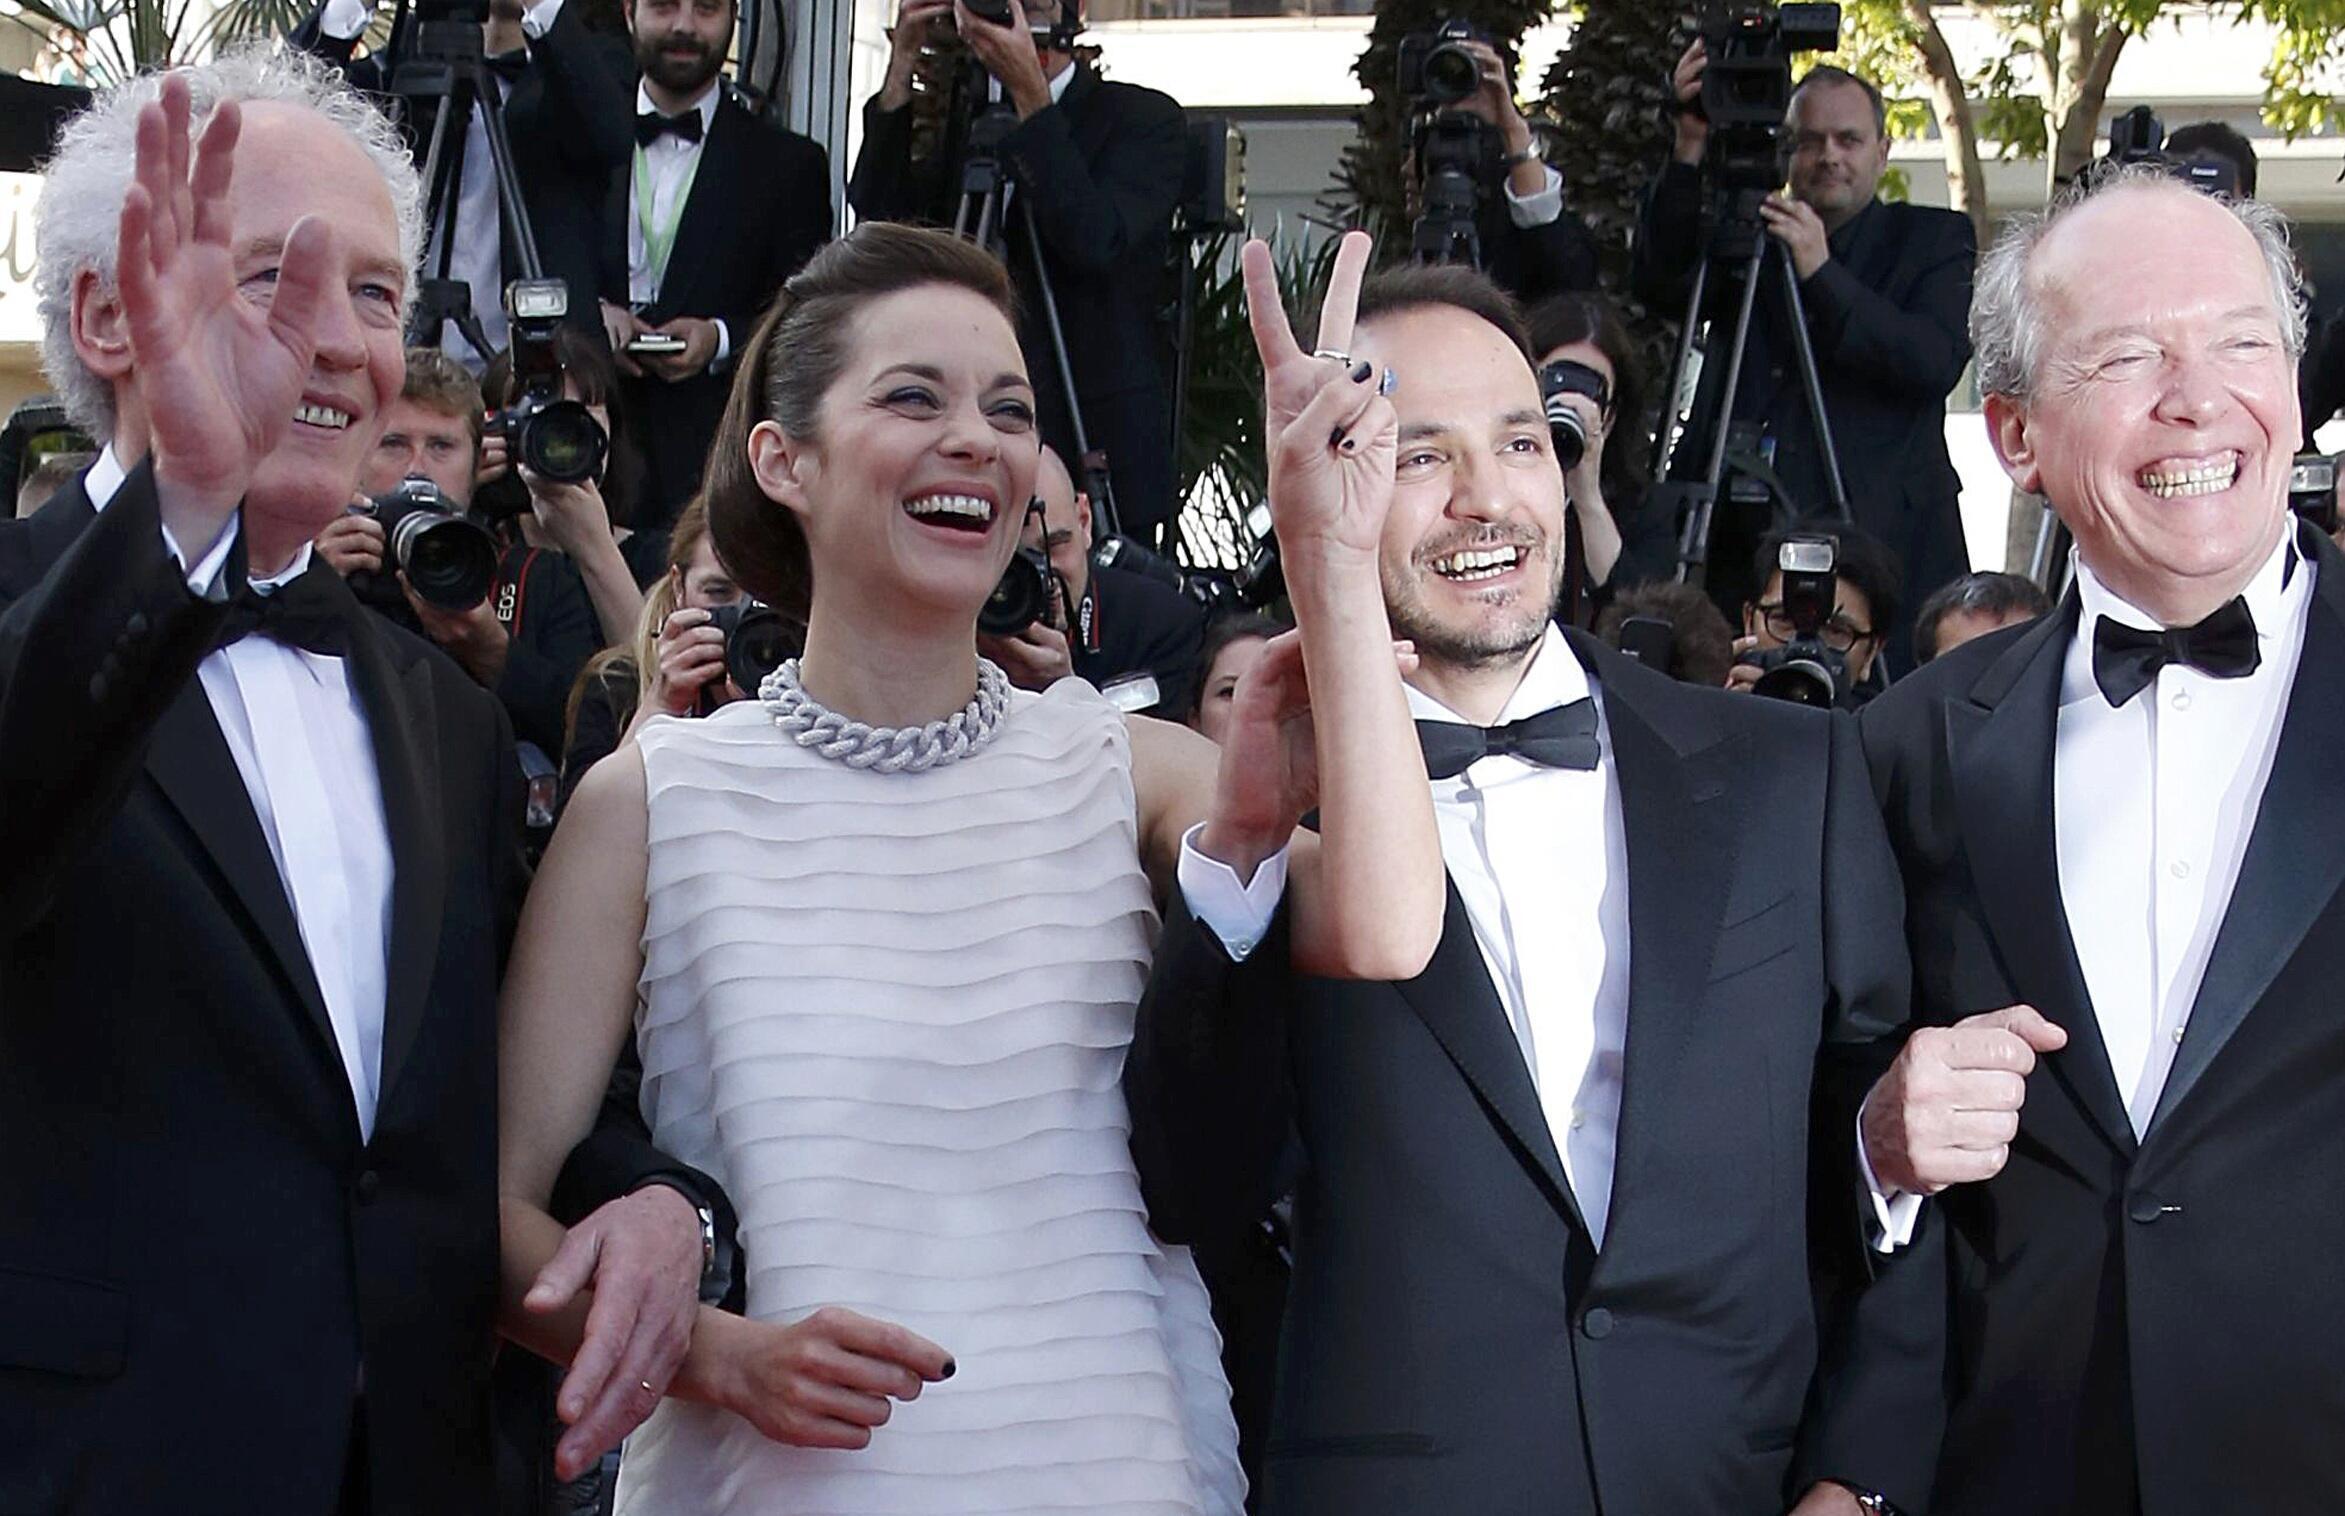 Жан-Пьер Дарденн (слева) и Люк Дарденн (справа) с актерами Марион Котийяр и Фабрицио Ронжьоне в Каннах